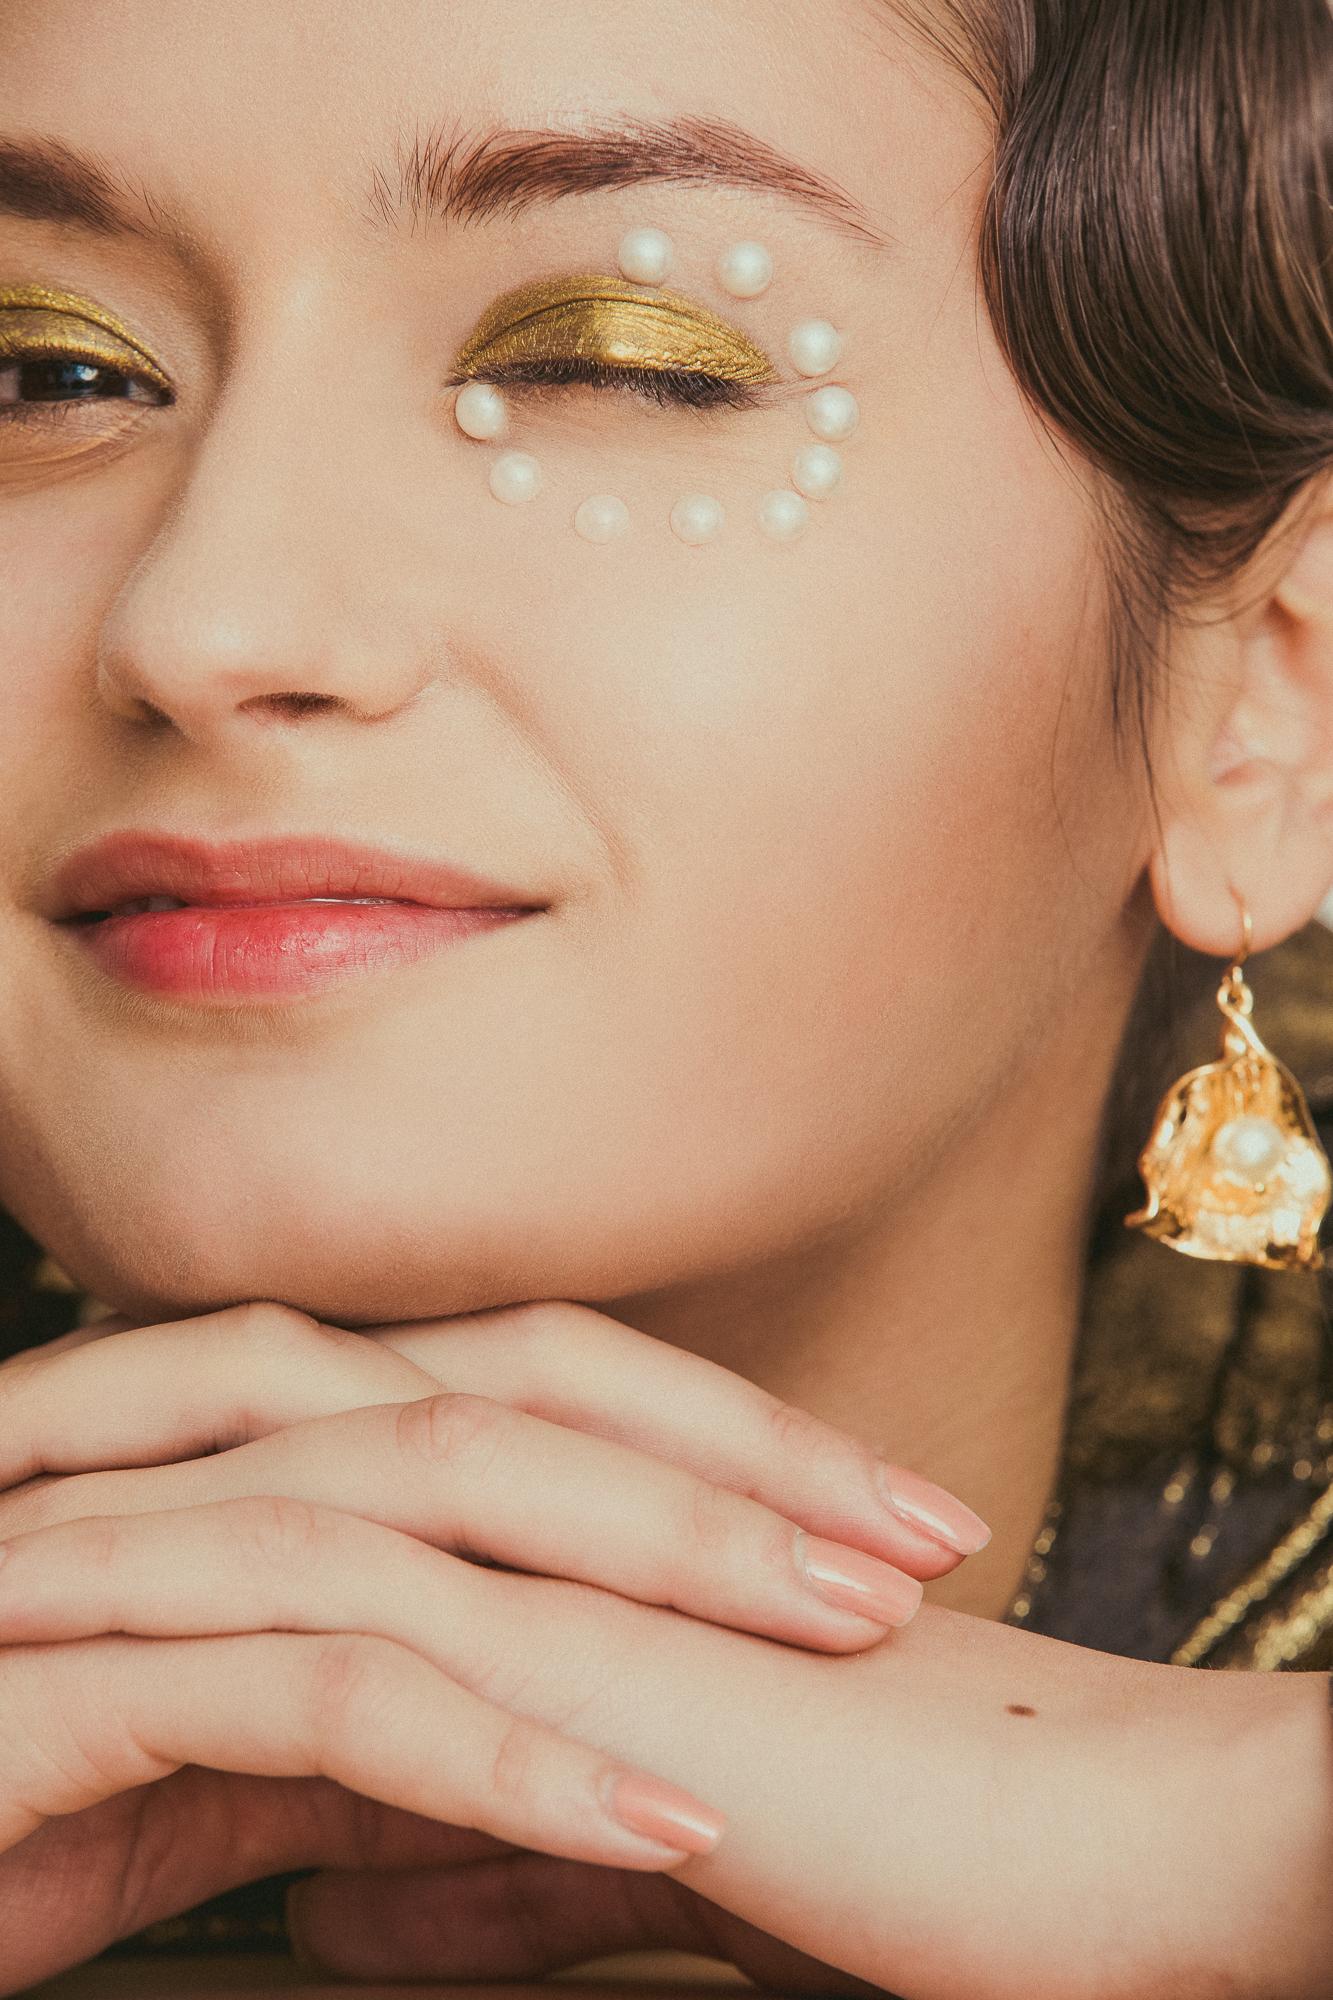 Duo-Linn-Lofficiel-Beauty-Editorial-03.jpg